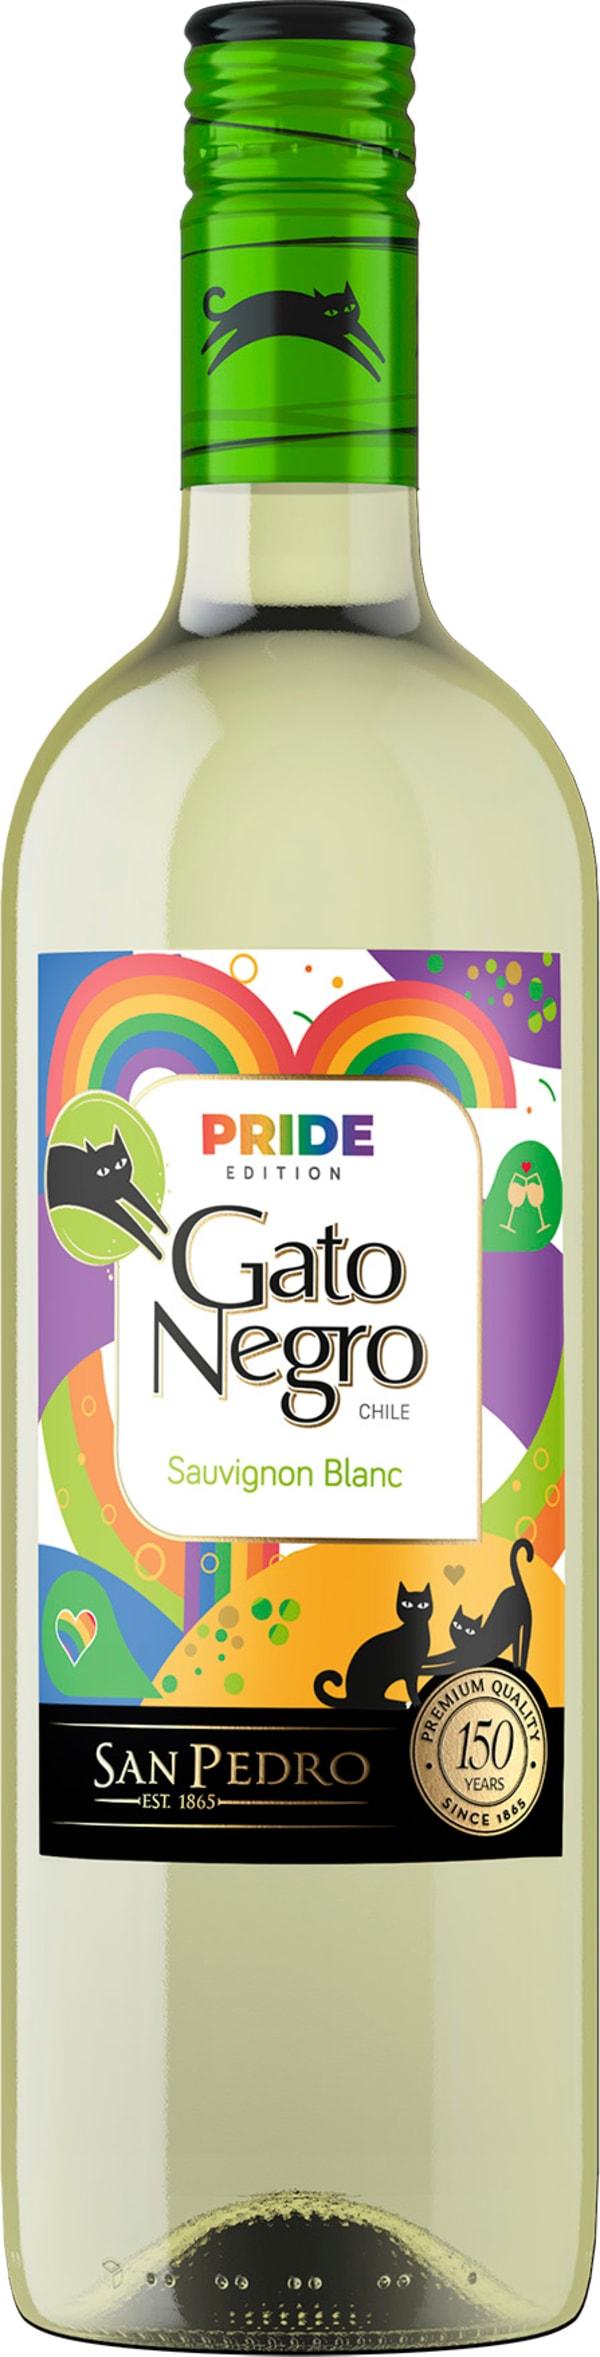 Gato Negro Sauvignon Blanc 2019